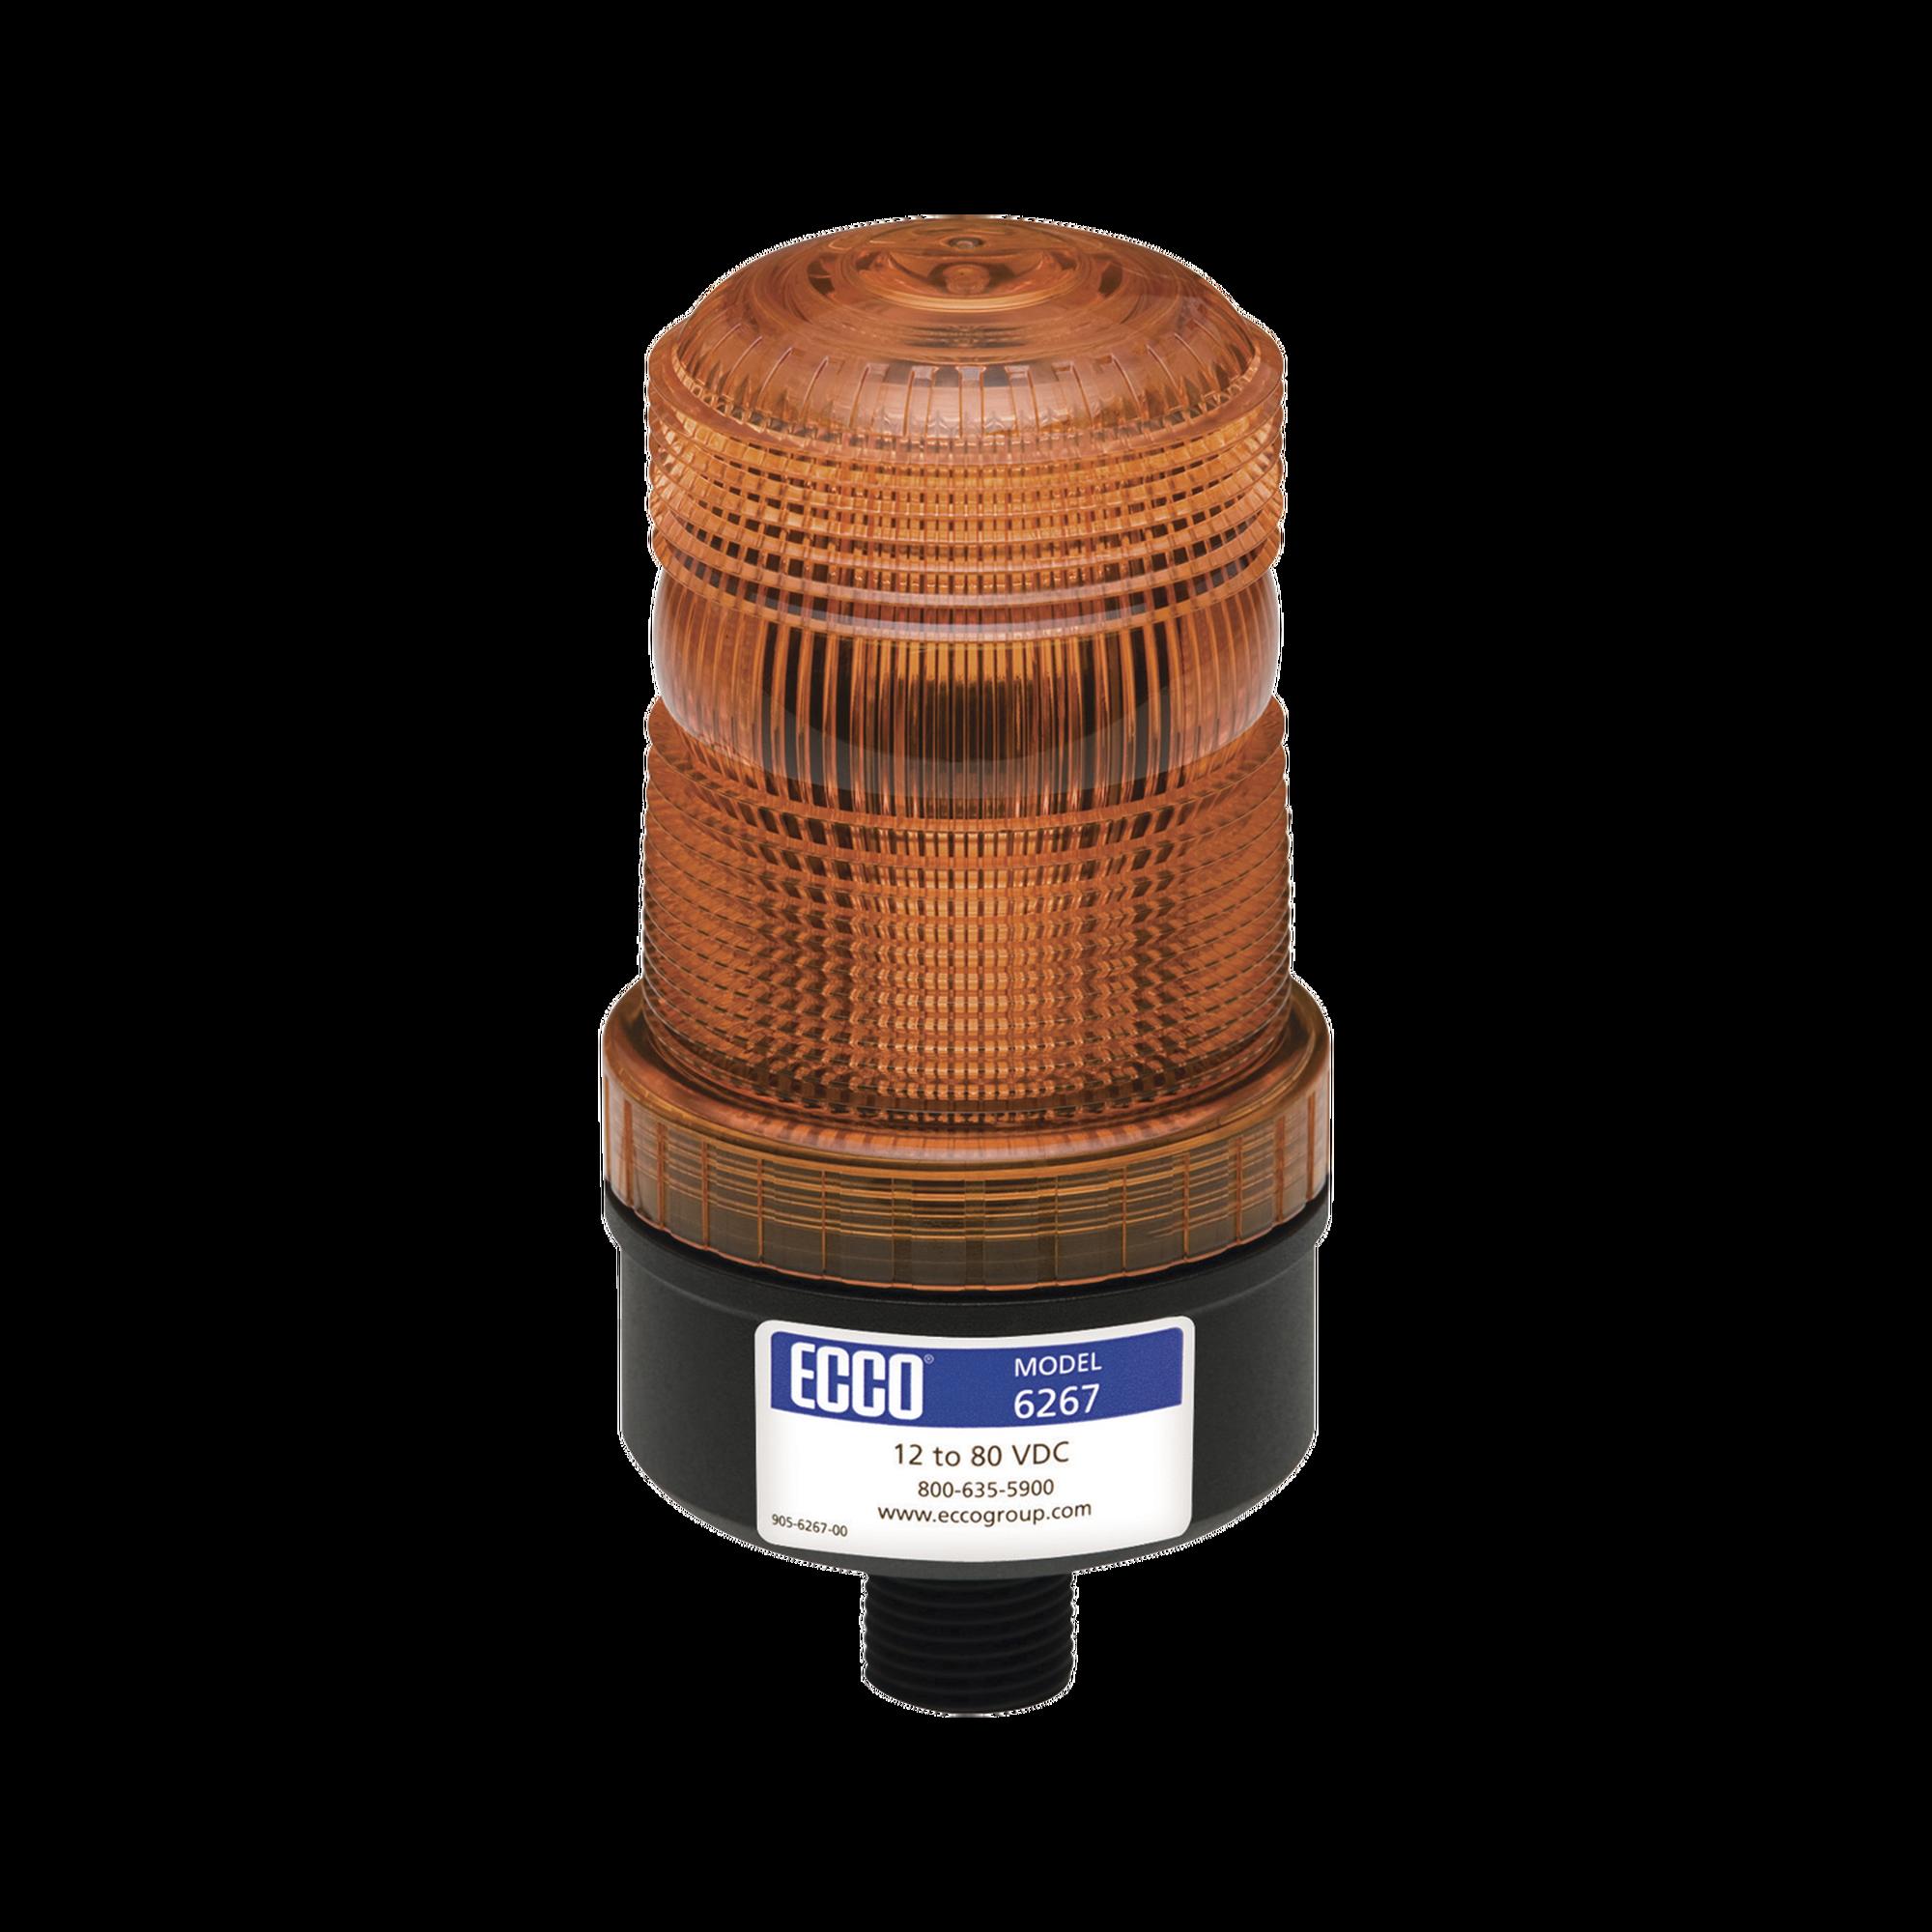 Mini baliza de LED color ambar montaje permanente SAE Clase III